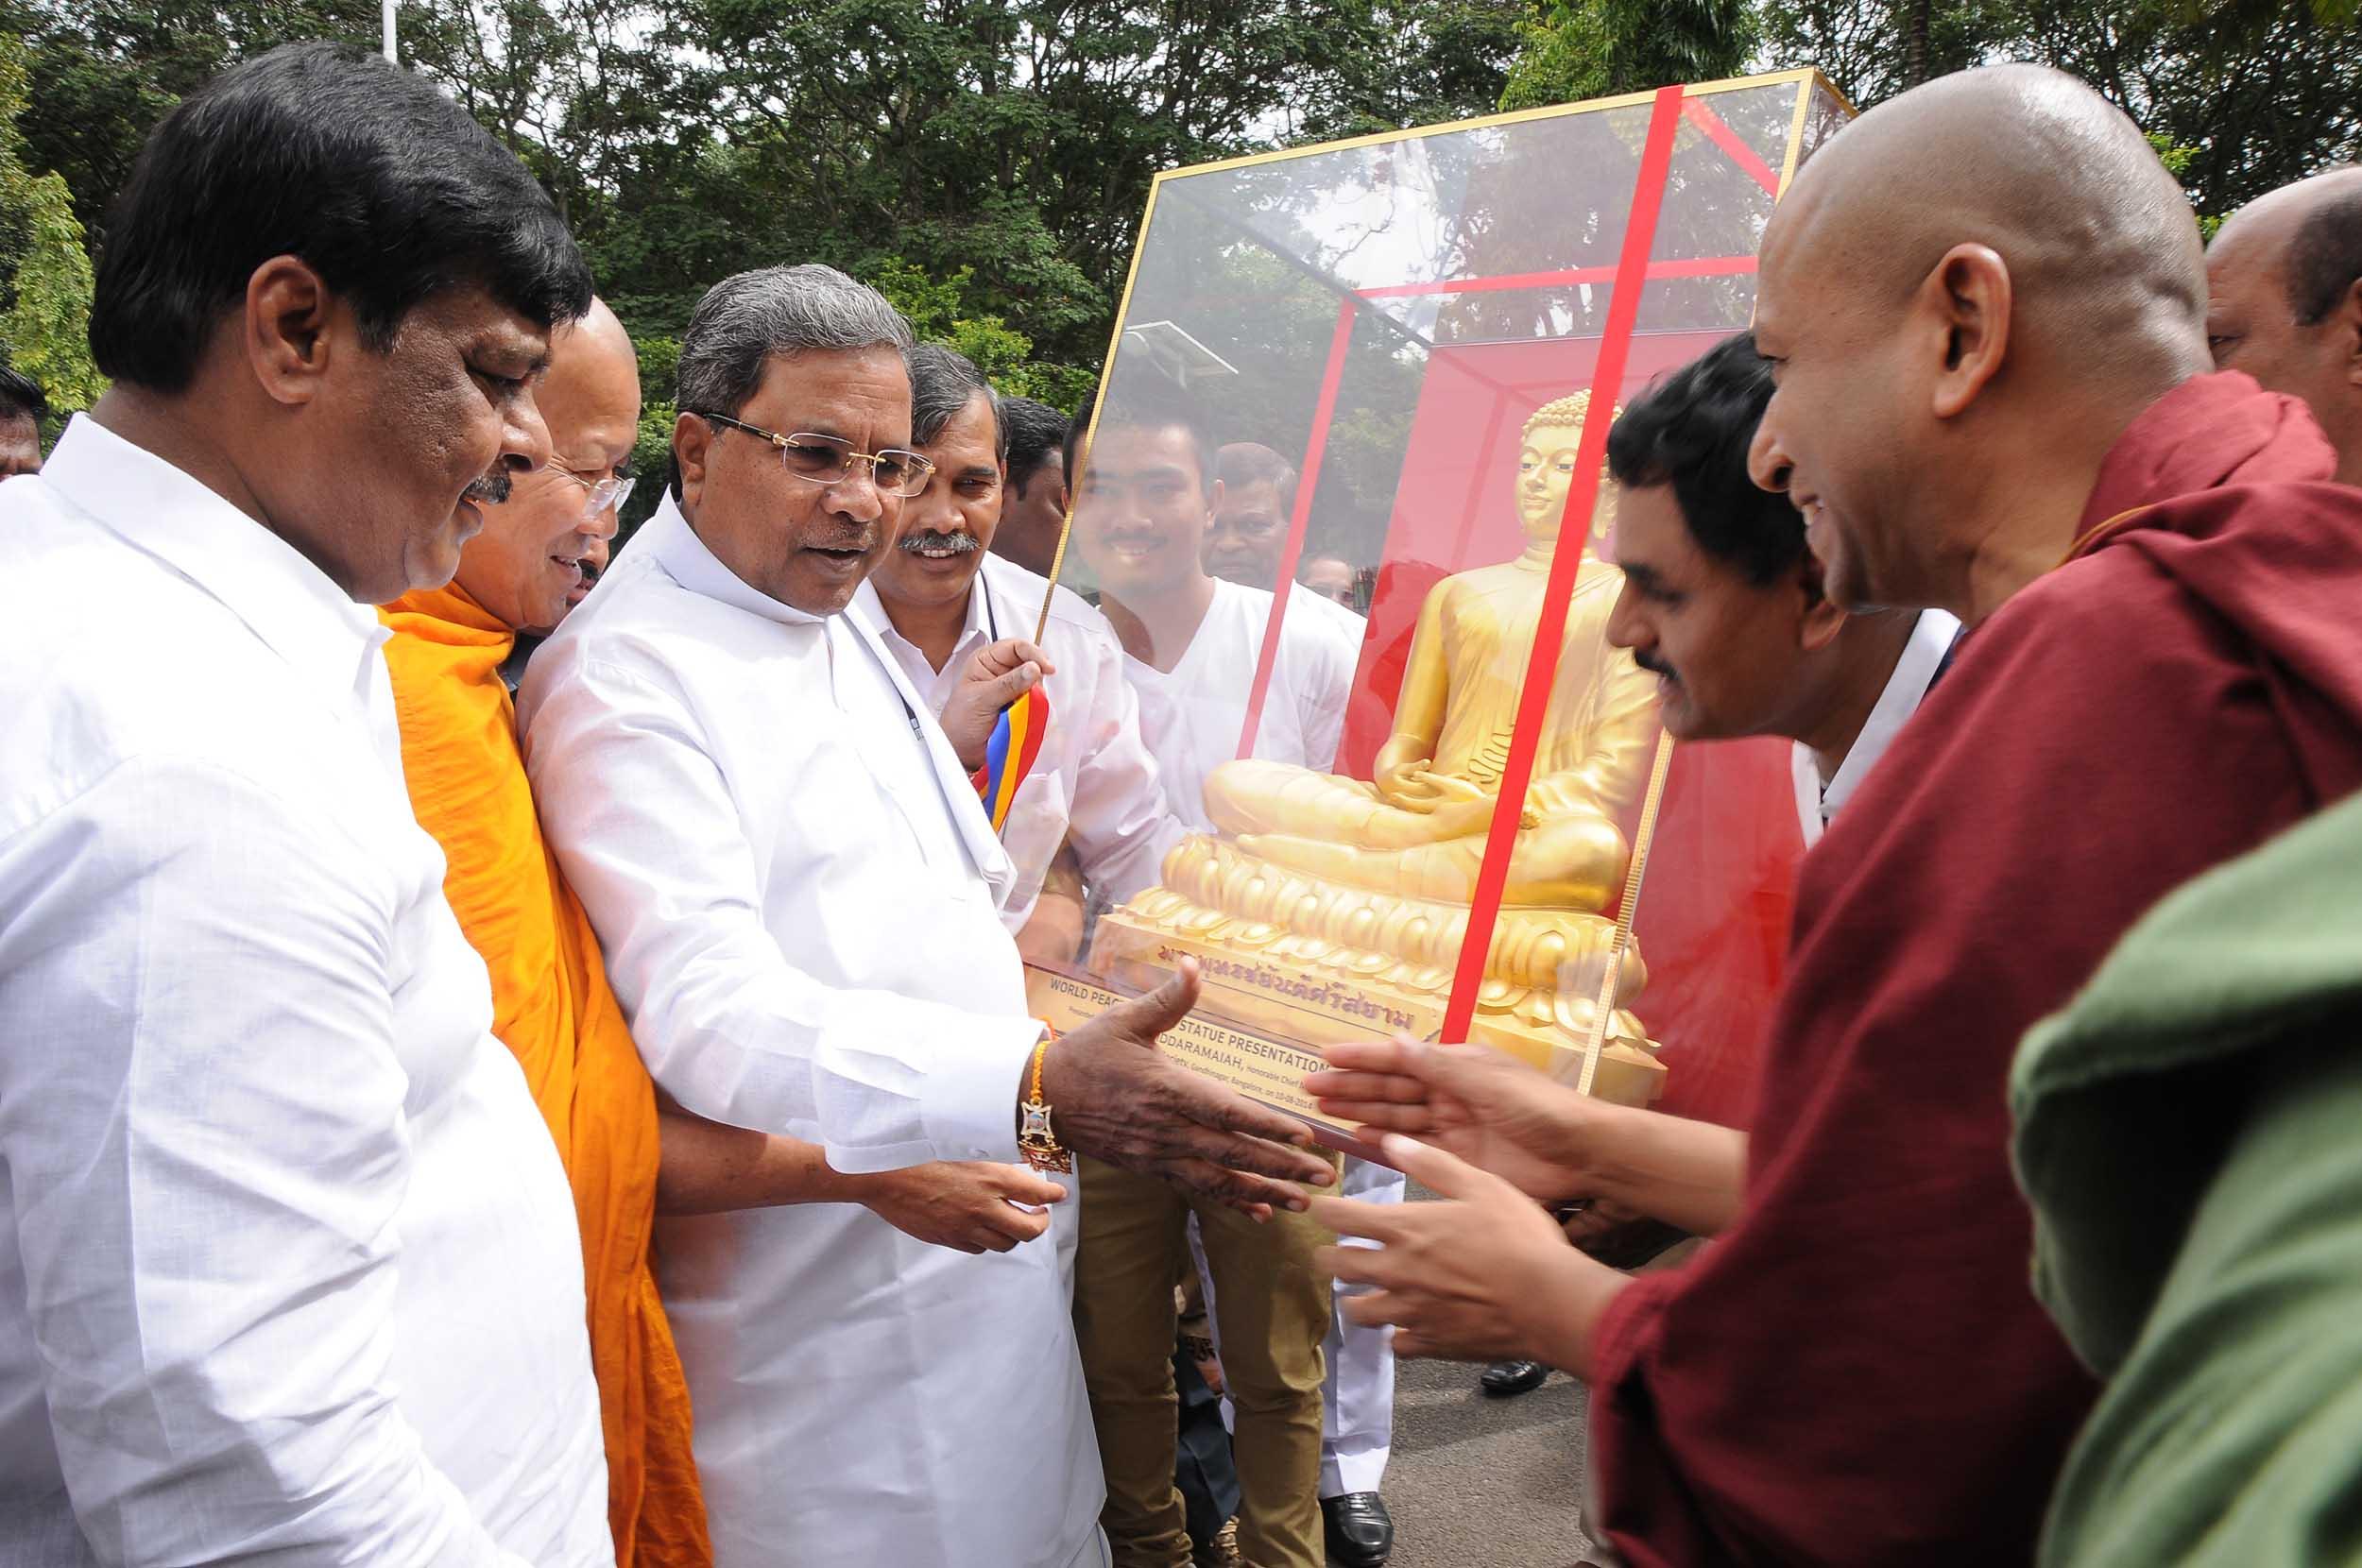 buddha-statue-distribution-mahabodhi-royal-thai-for world-peace-2014 (9)